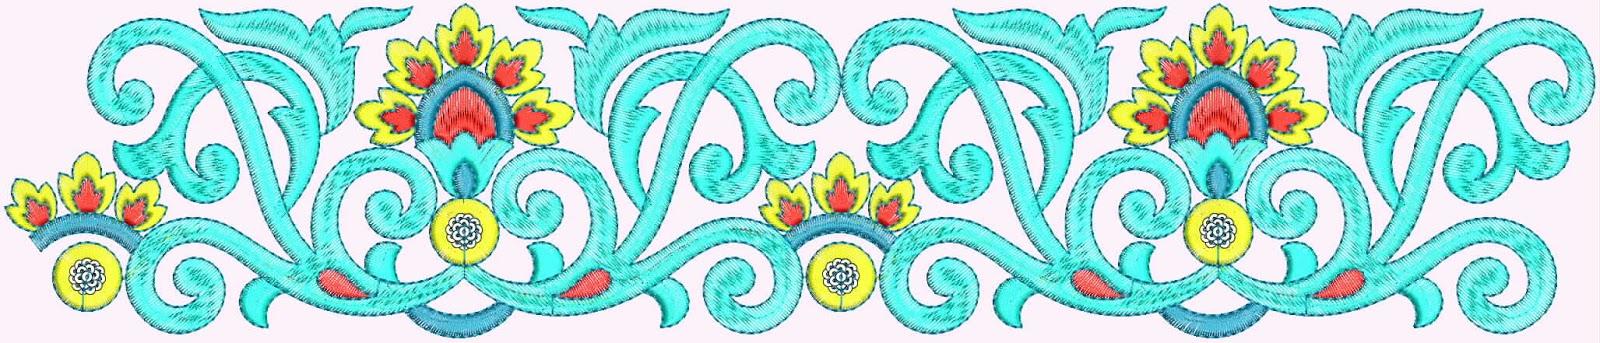 Embdesigntube: Latest Saree Designs - Saree Borders Designs